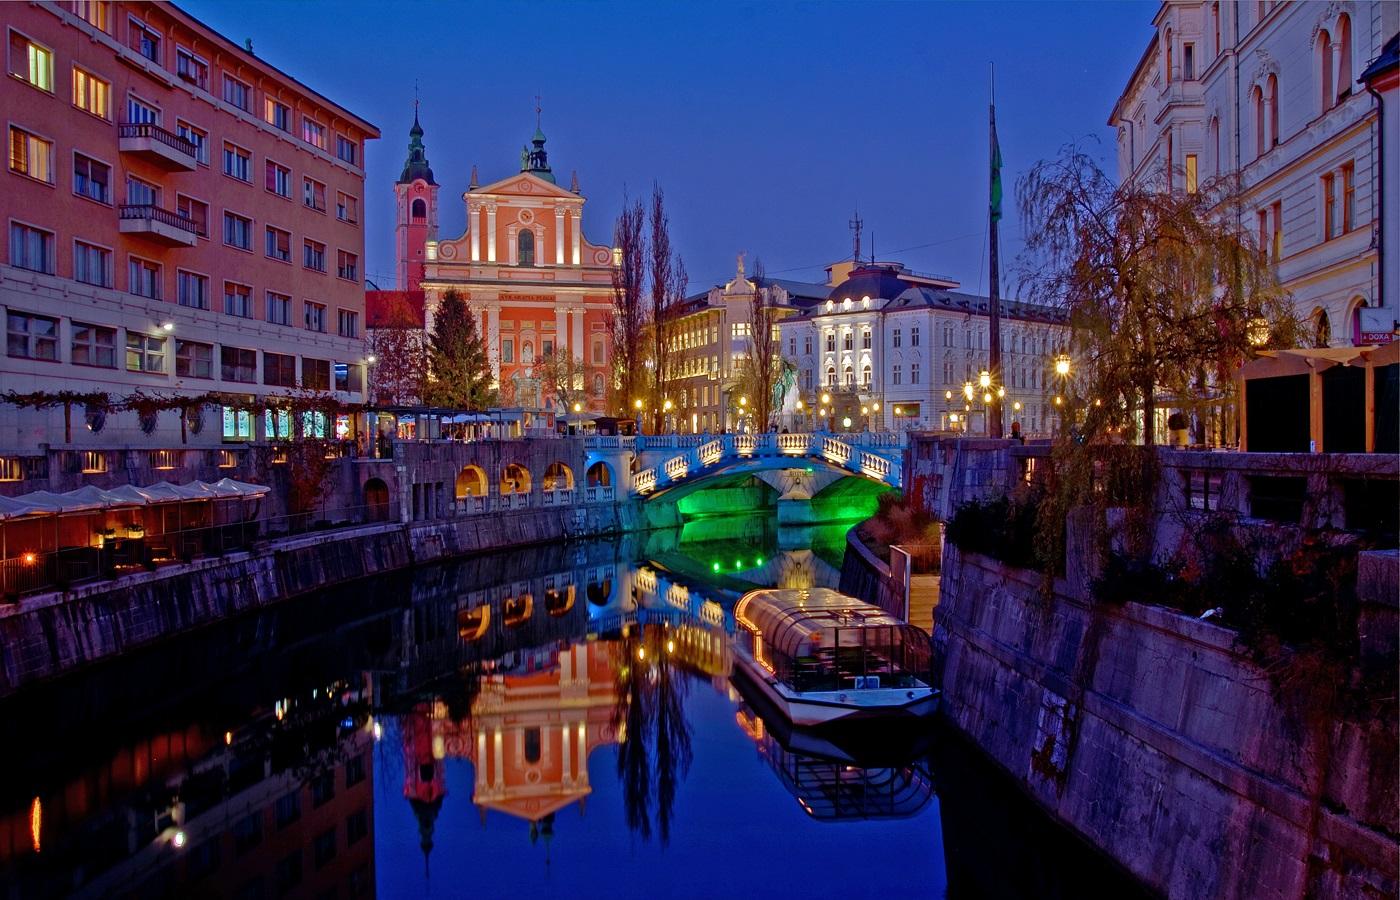 Ljubljana Nightshot Mini Vacation